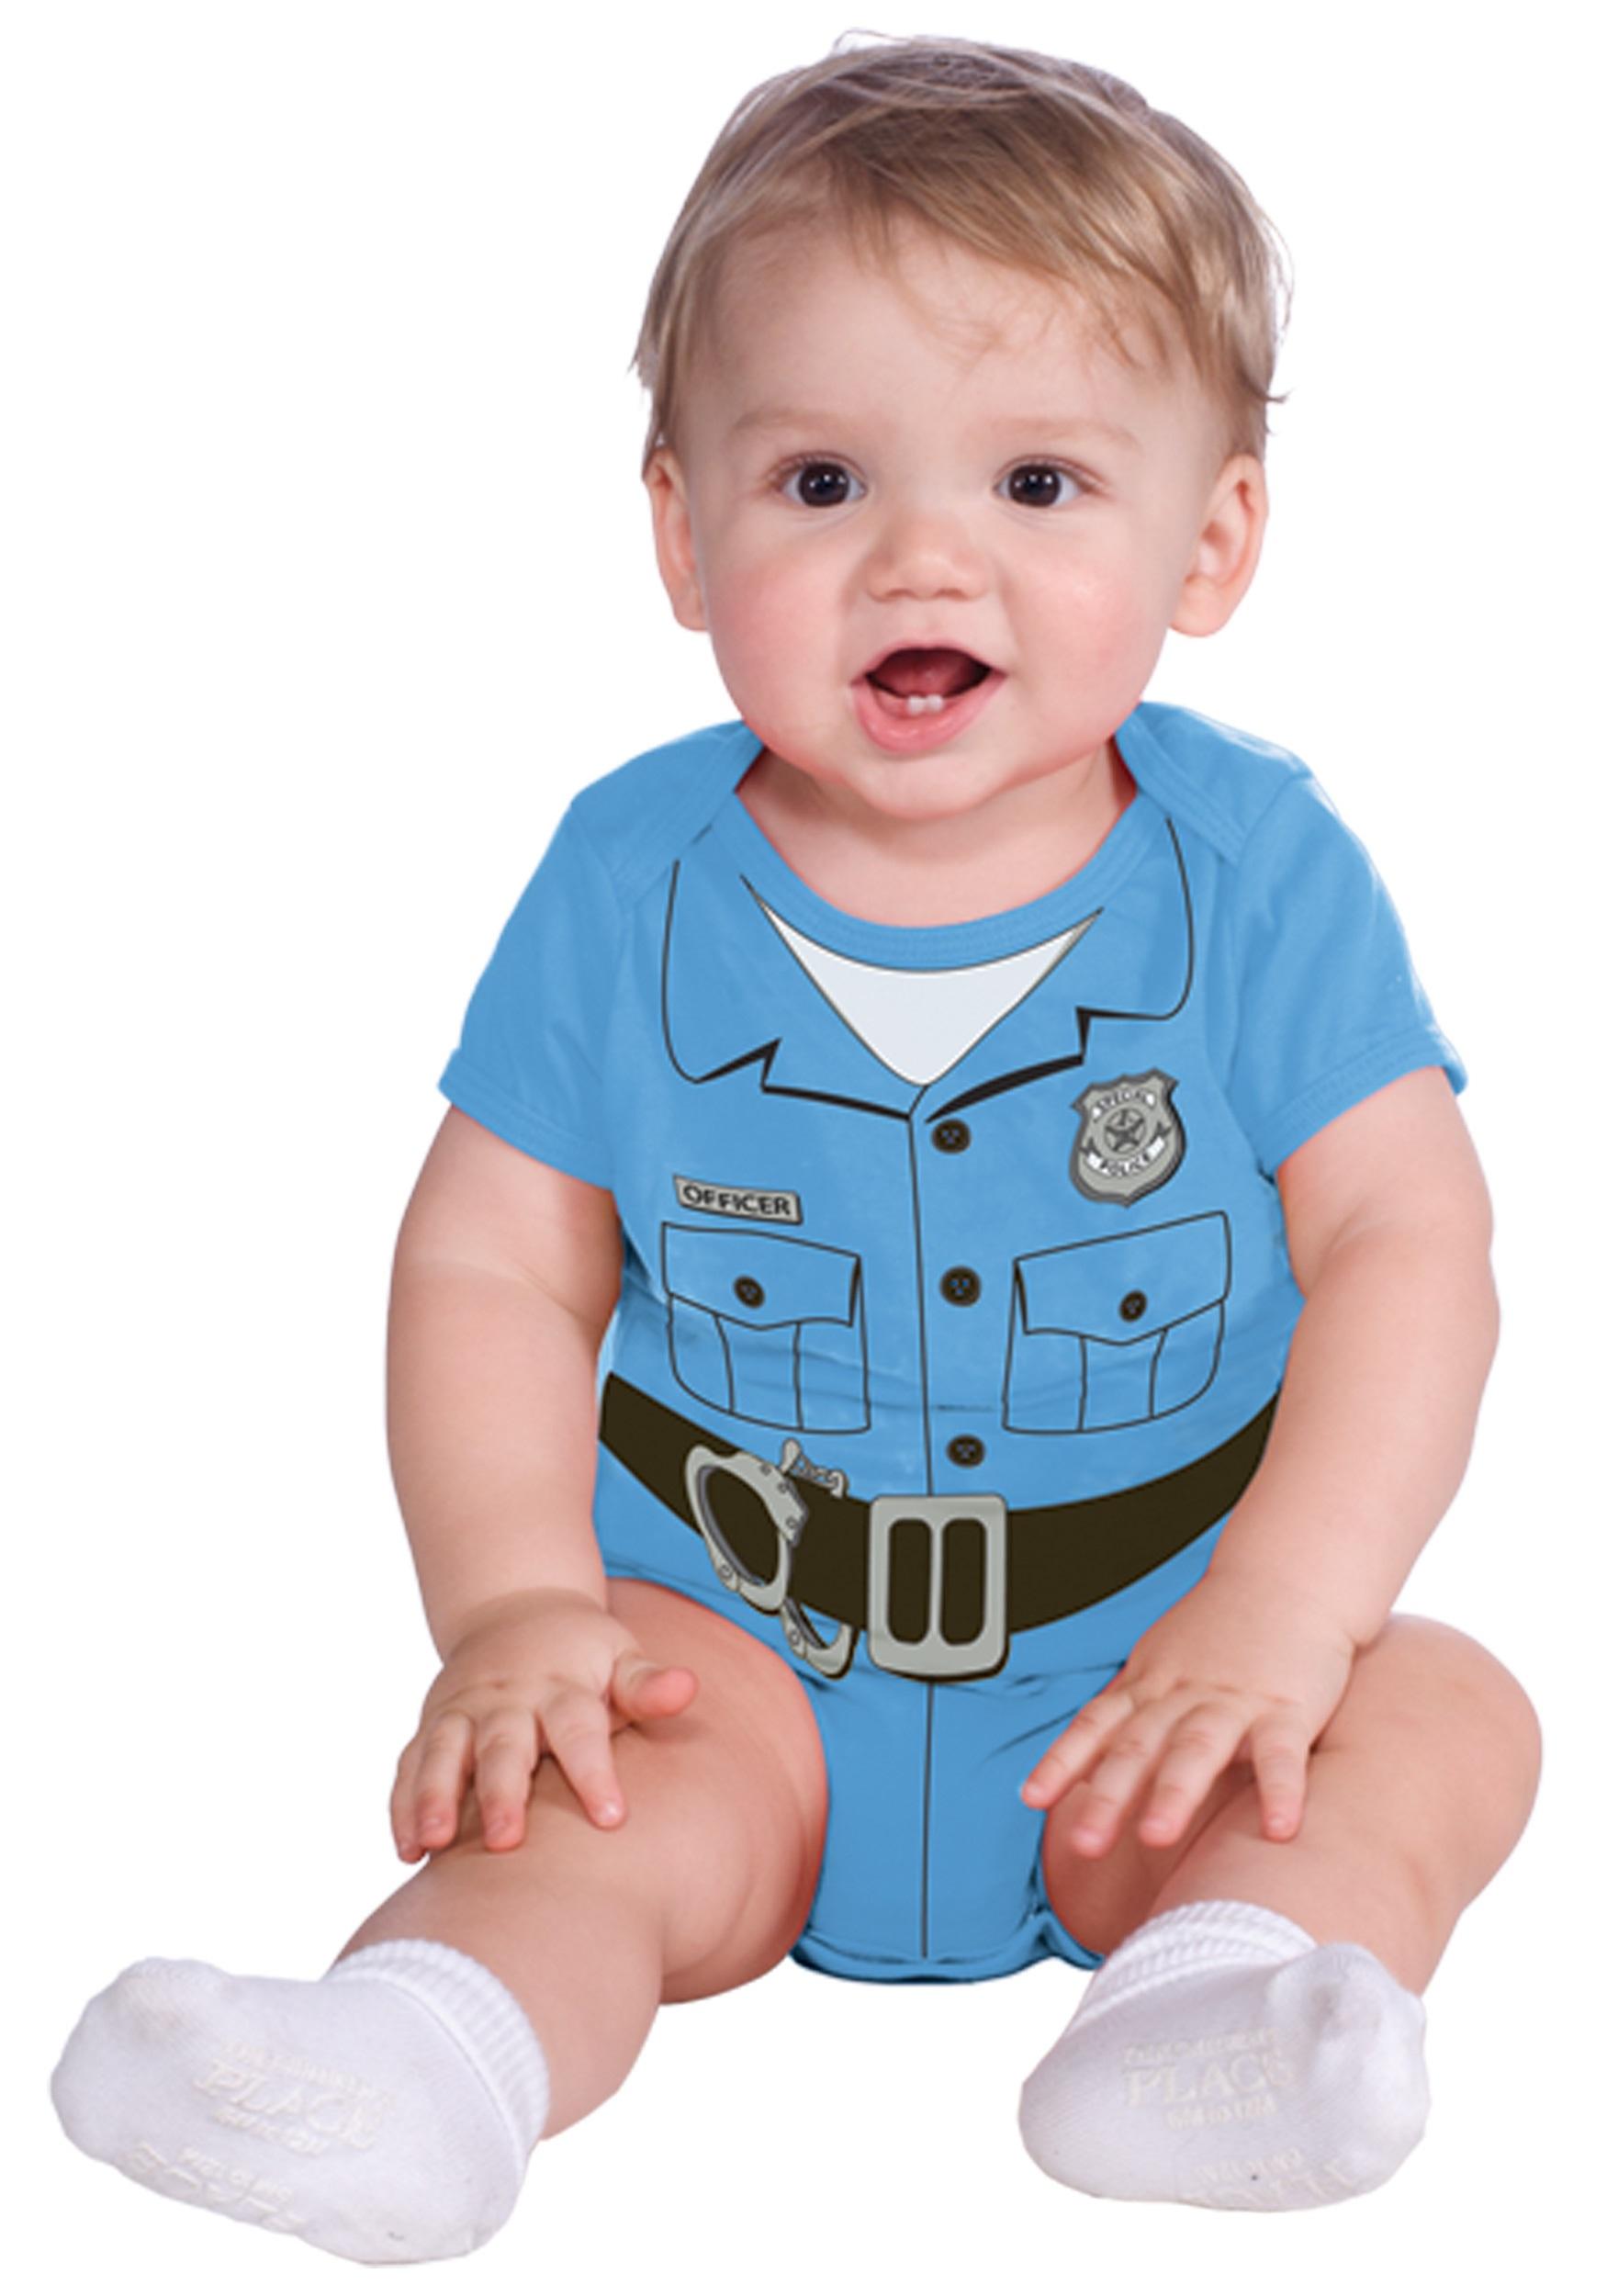 Police Officer Onesie Costume  sc 1 st  Halloween Costumes & Police Officer Onesie Costume - Halloween Costumes